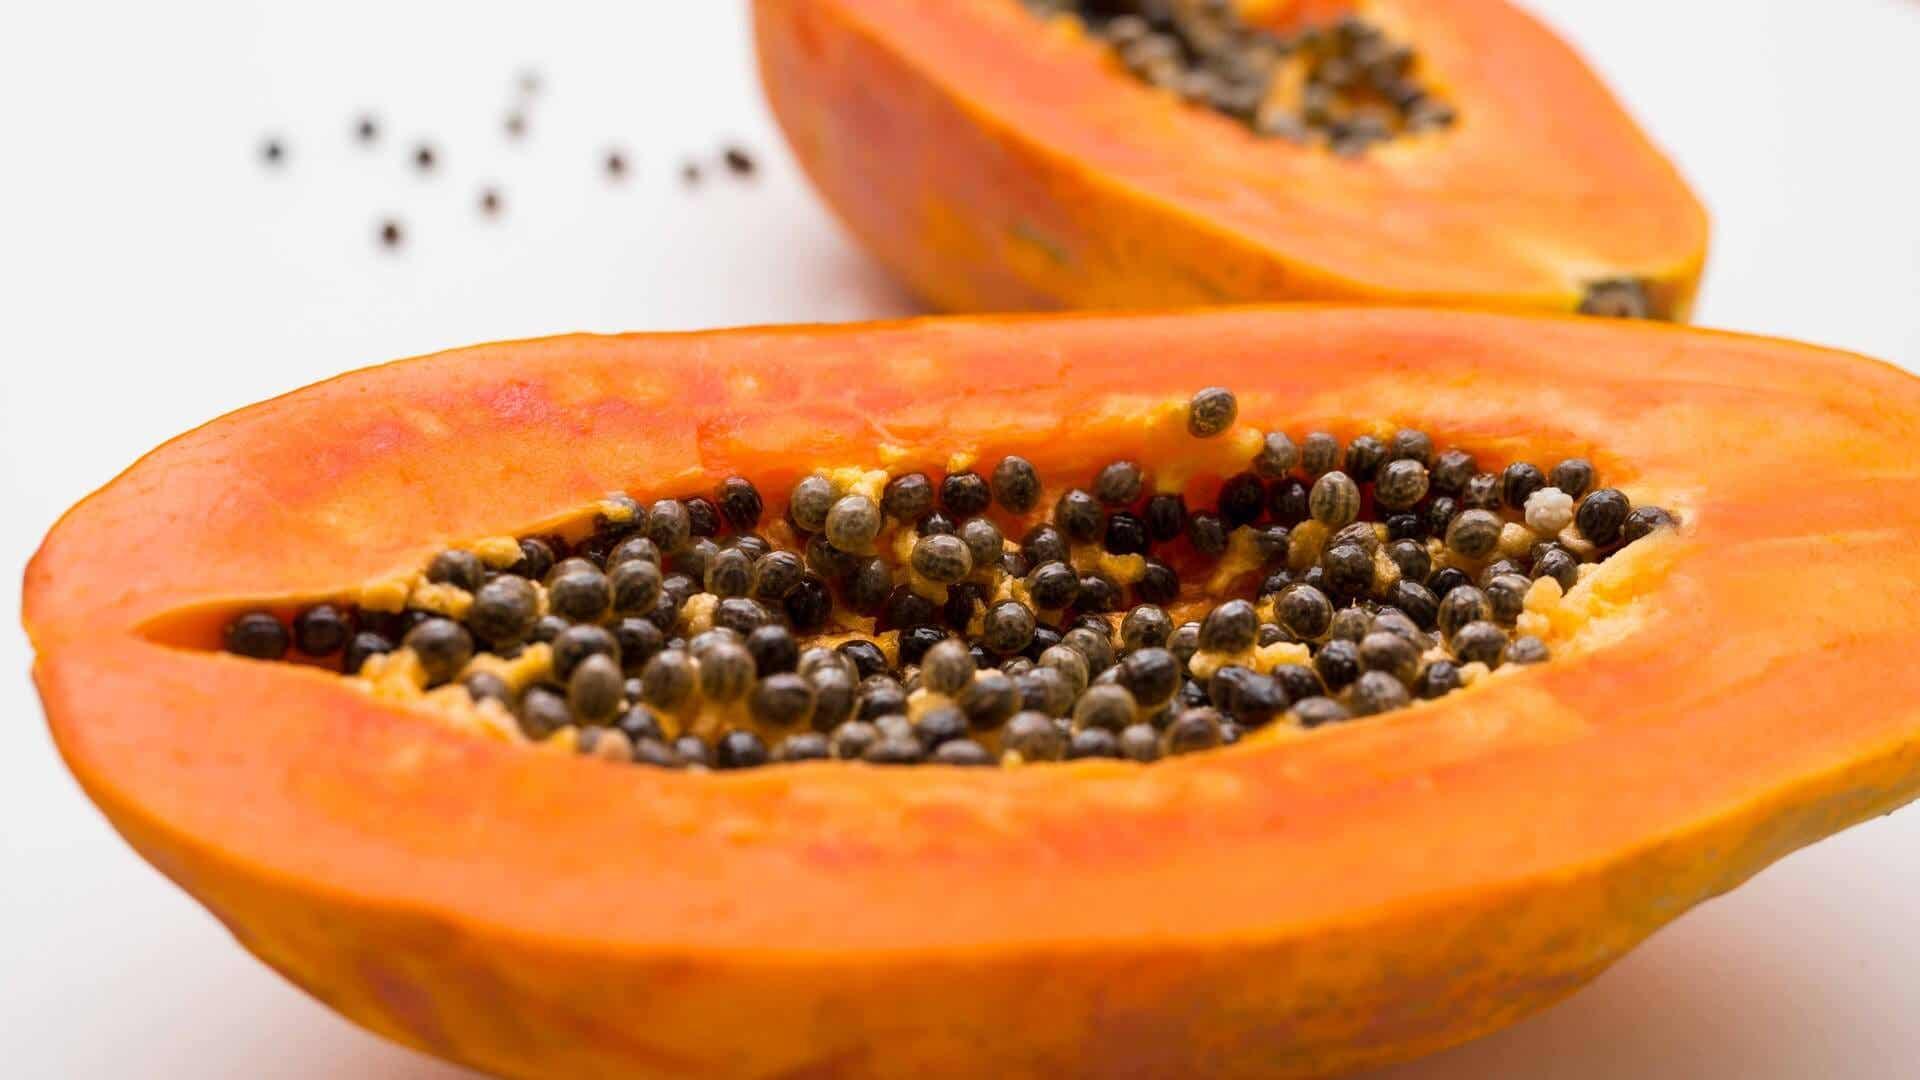 De la papaye.